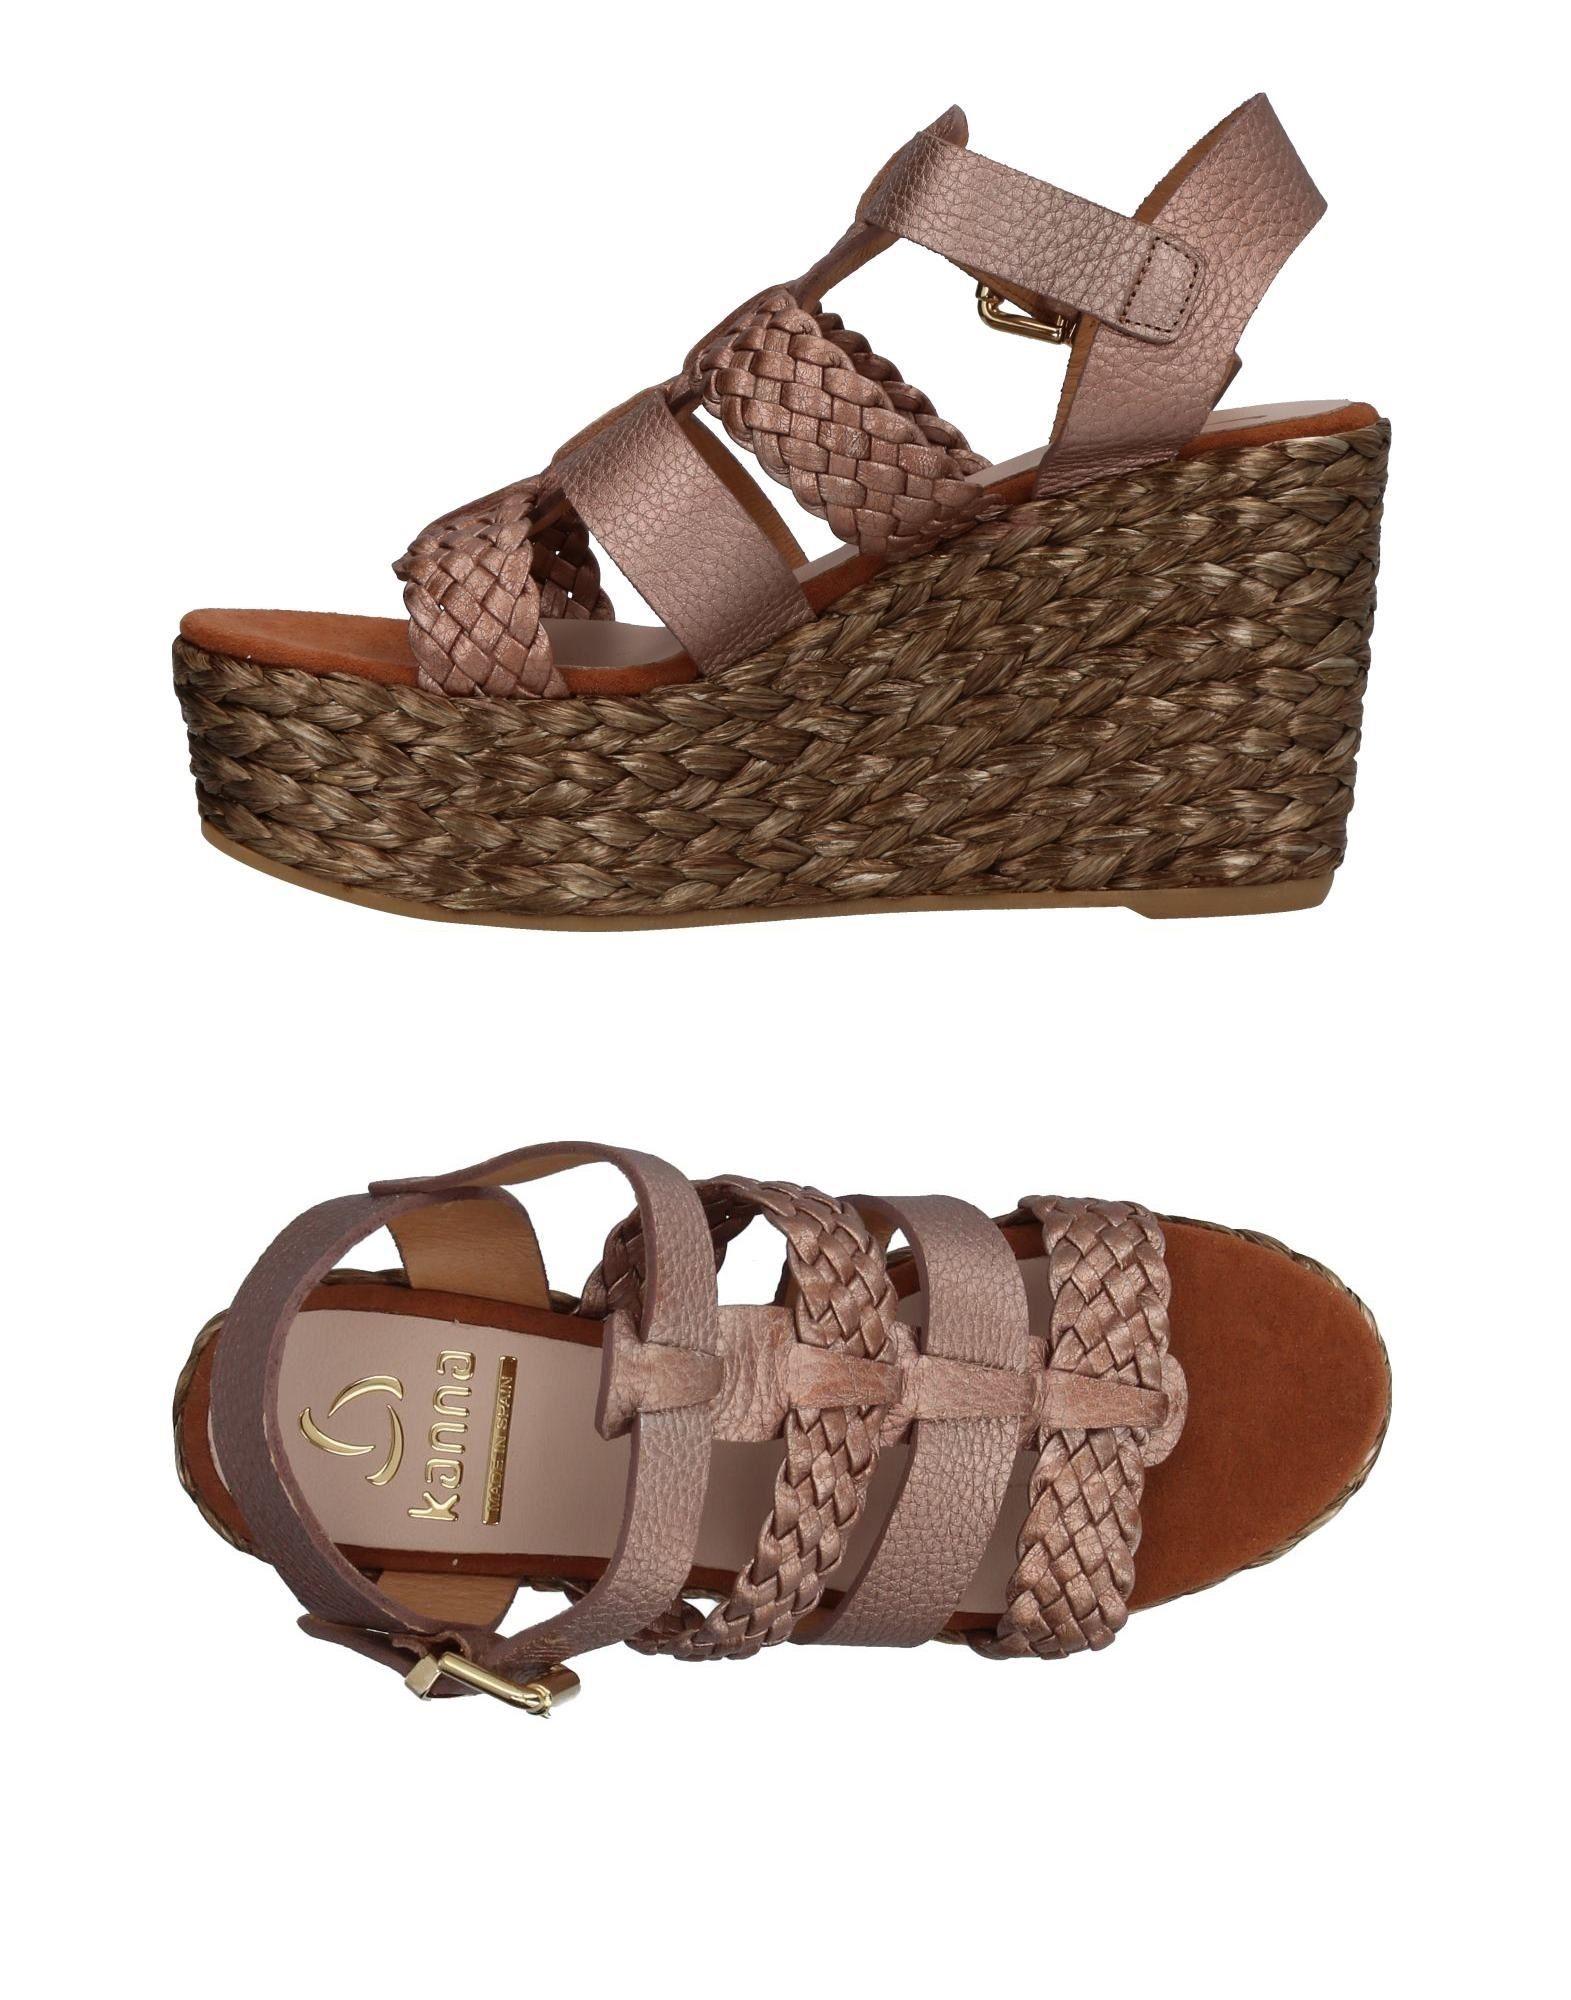 Kanna Sandalen Damen  11405551TO Gute Qualität beliebte Schuhe